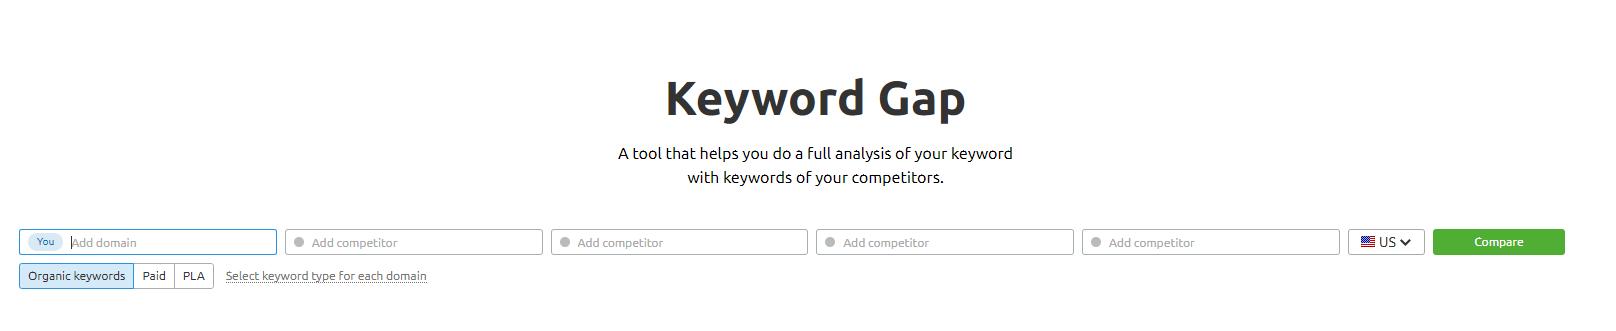 Keyword GAP tools